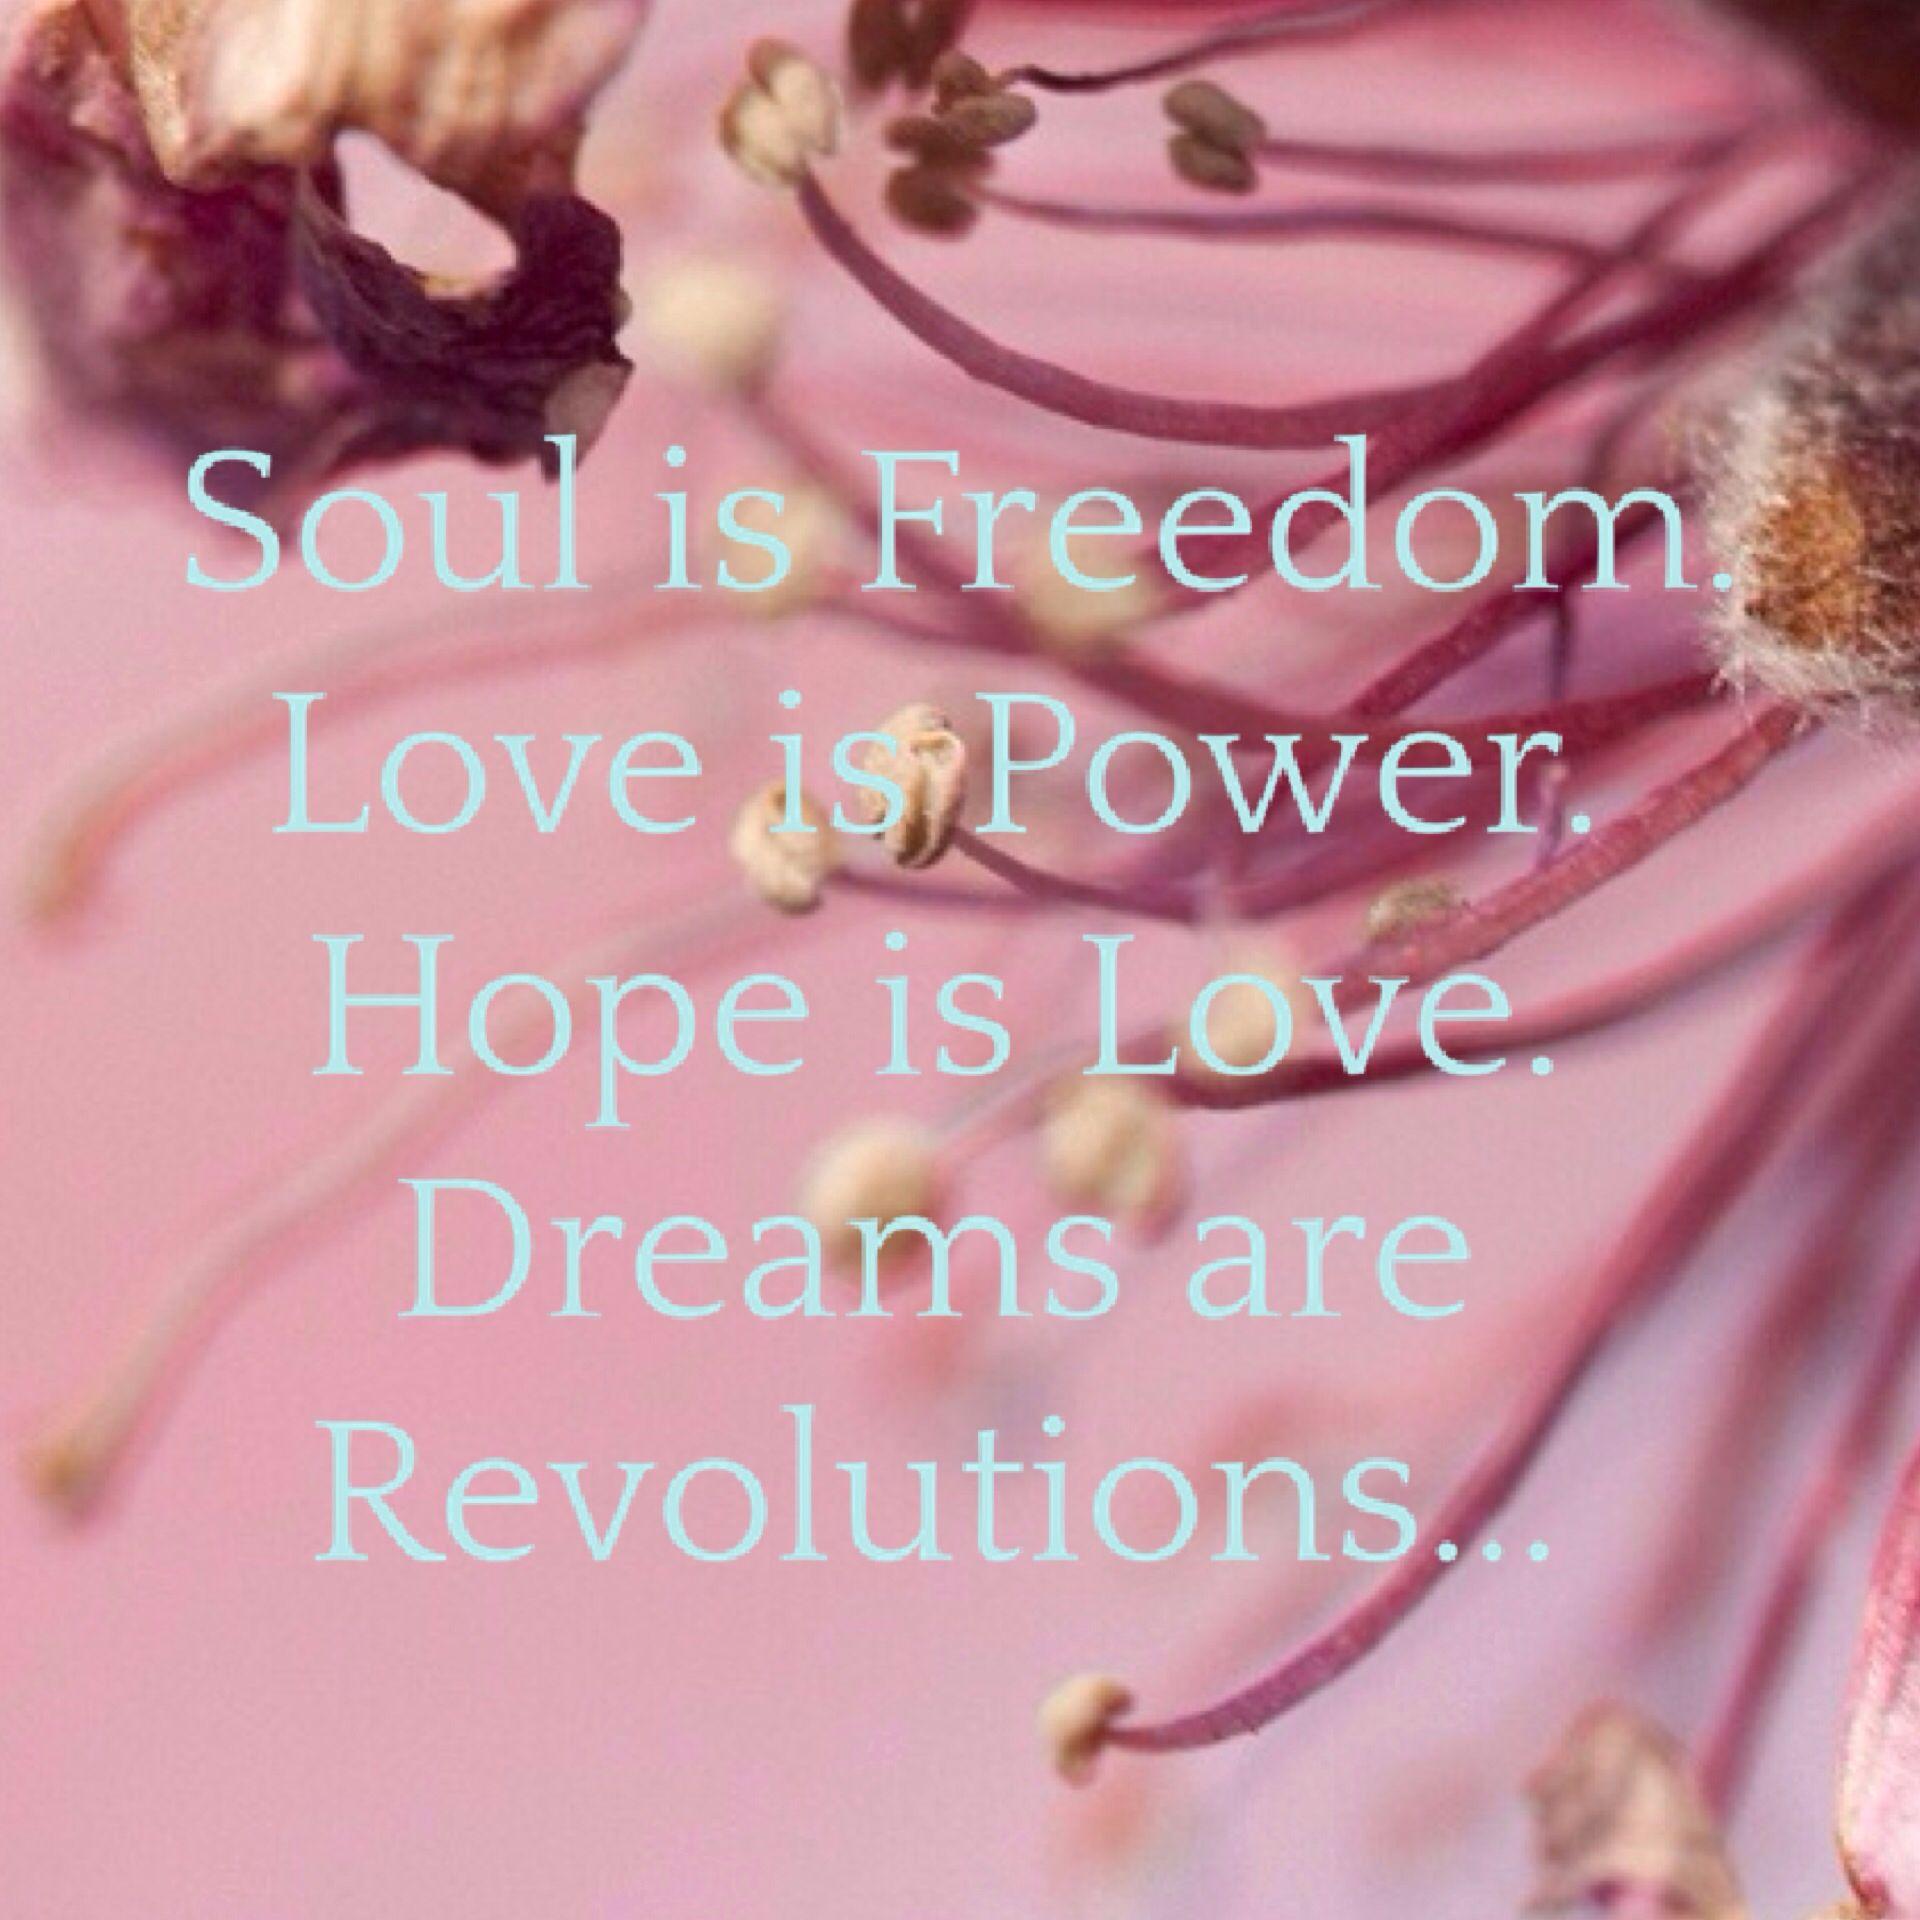 Soul is Freedom. Love is Power. Hope is Love. Dreams are Revolutions...  #quote #Soul is #Freedom. #Love is #Power. #Hope is #Love. #Dreams are  #Revolutions.